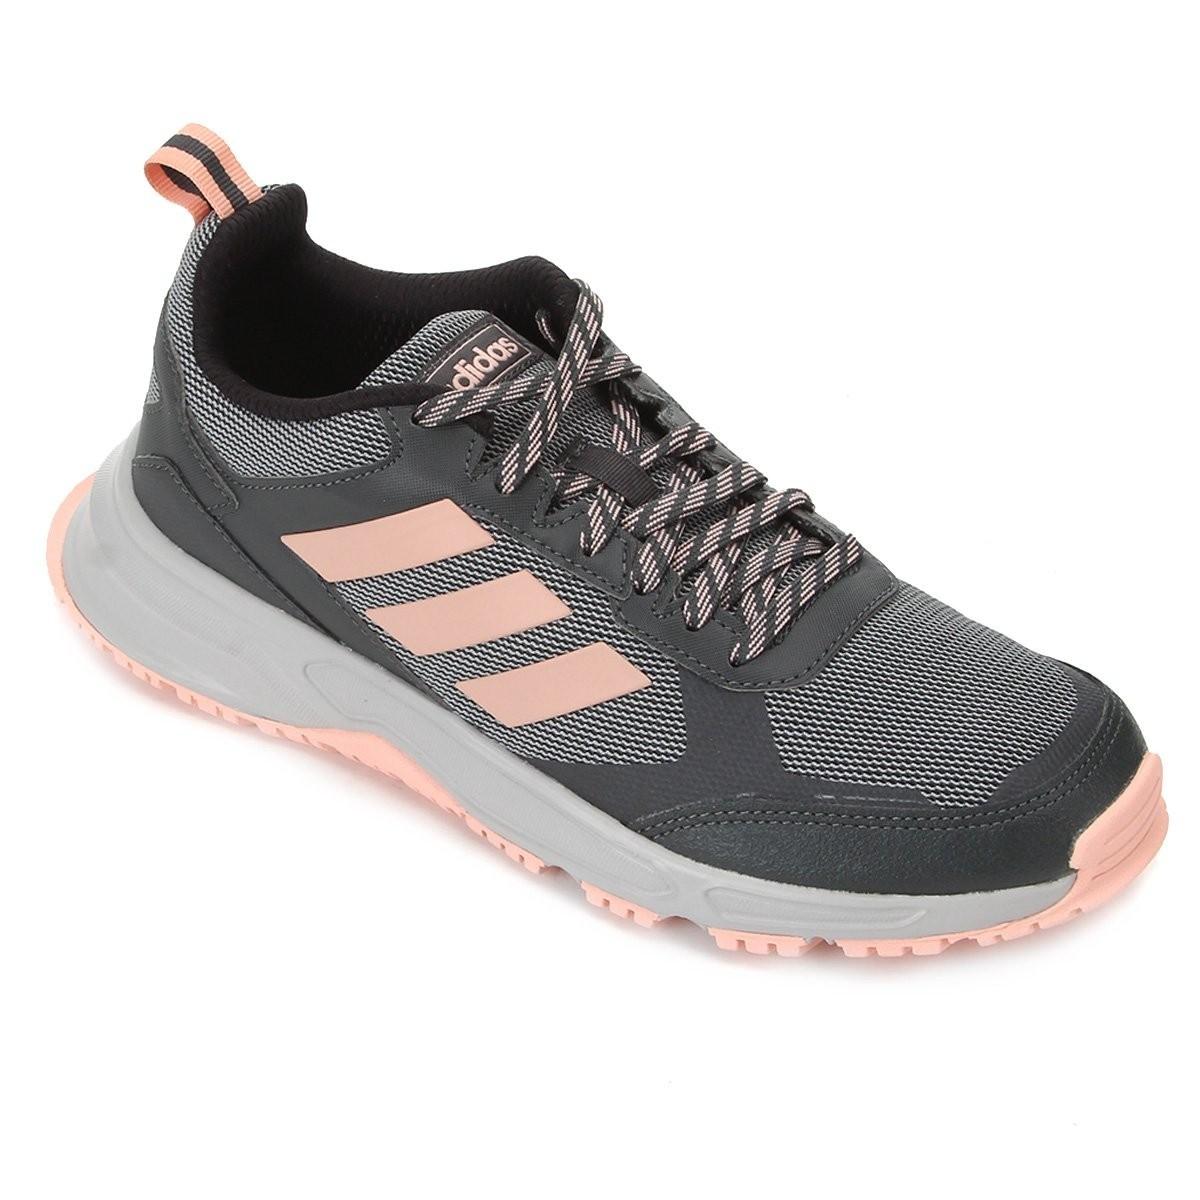 Tenis Feminino Adidas Rockadia Trail Esportivo Corrida